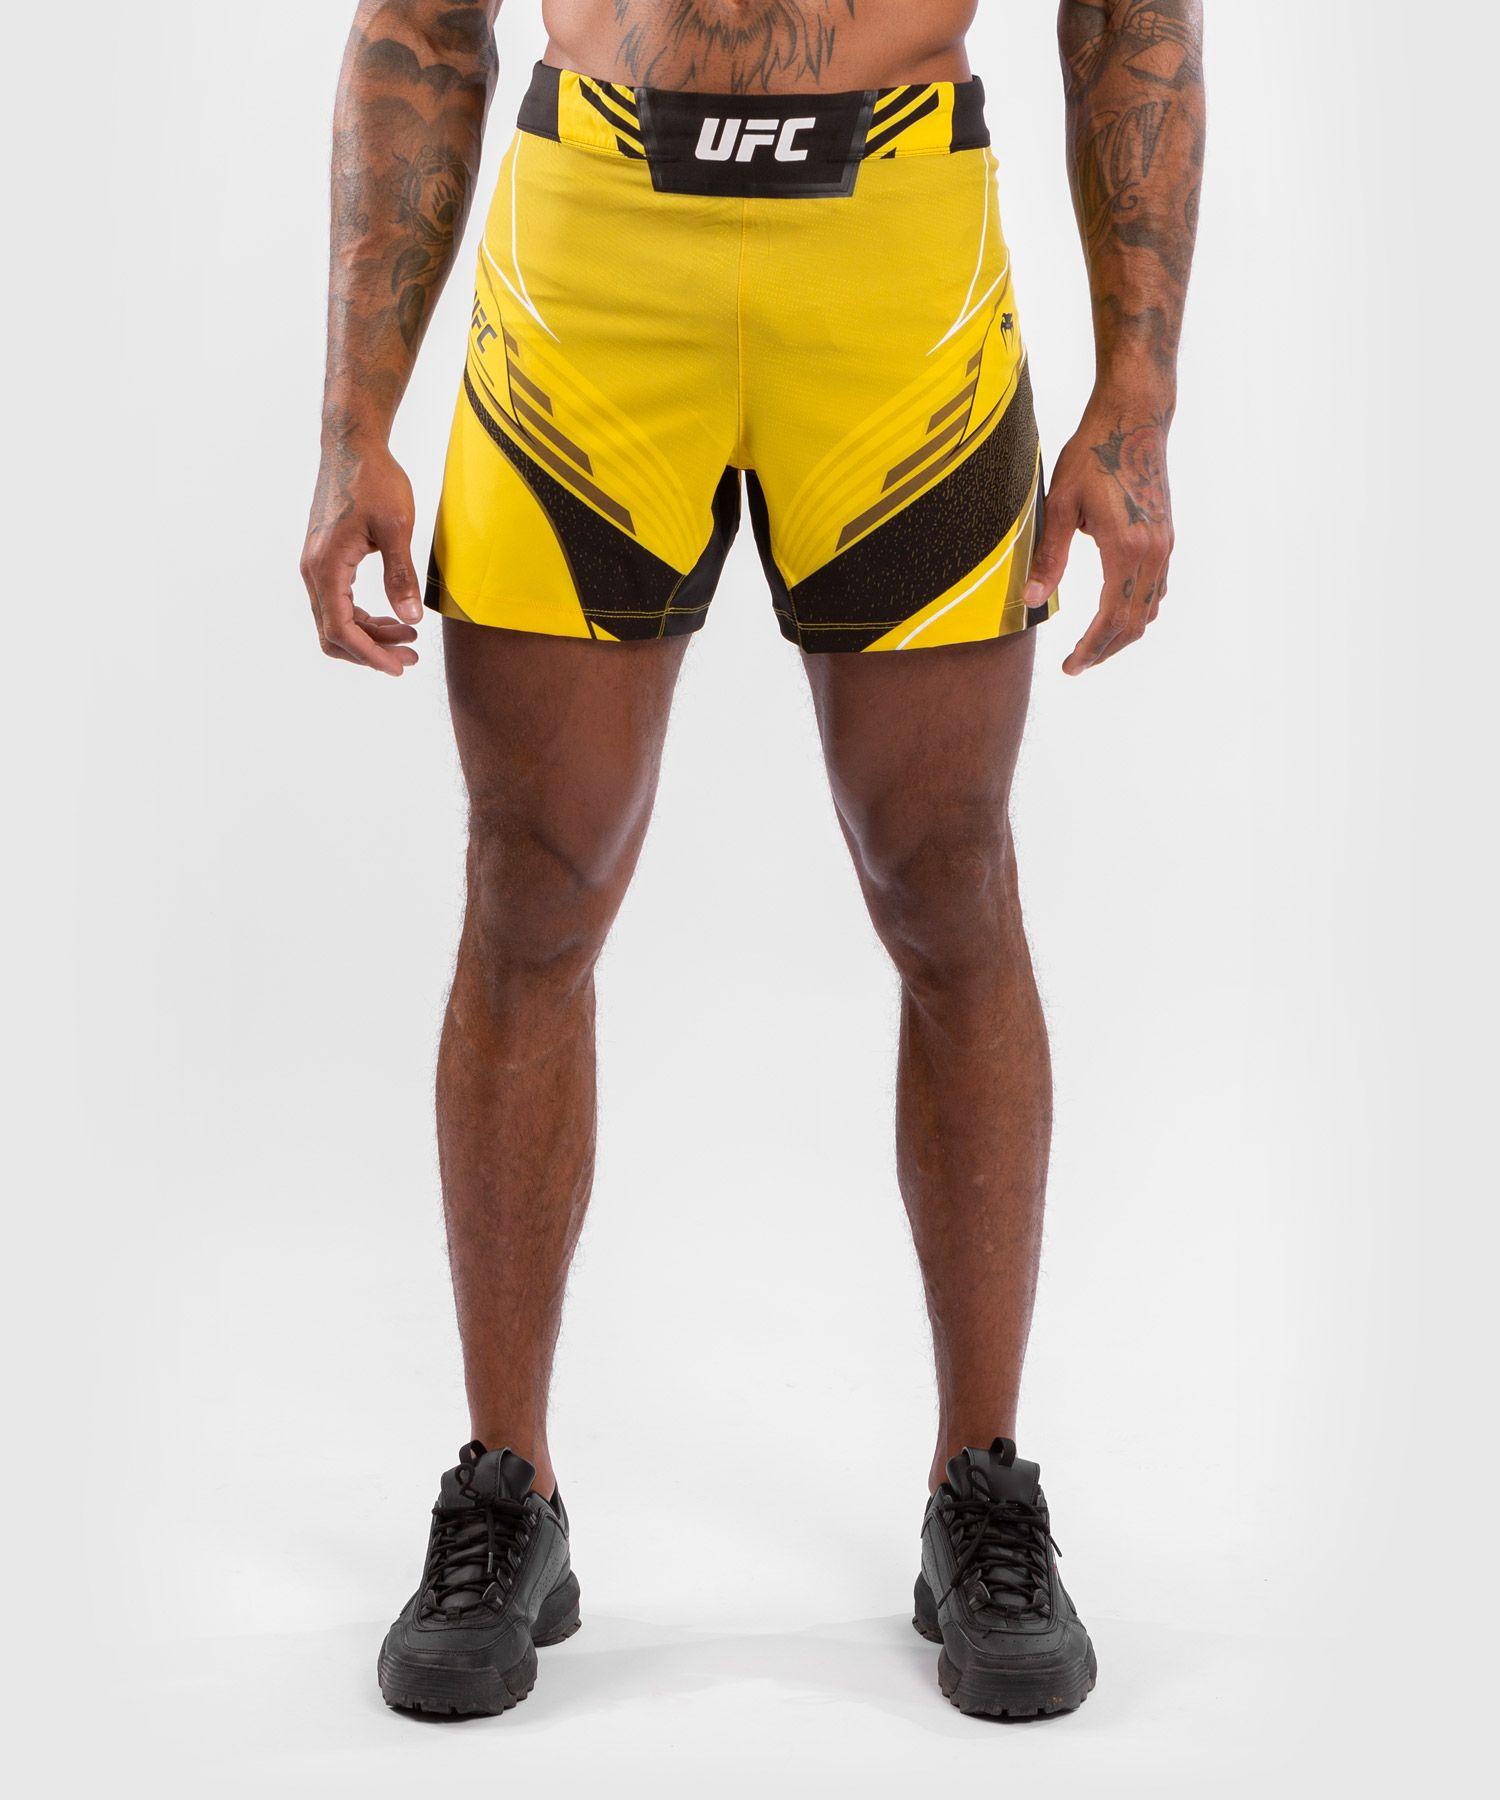 UFC Venum Authentic Fight Night Herenshort - Short Fit - Geel